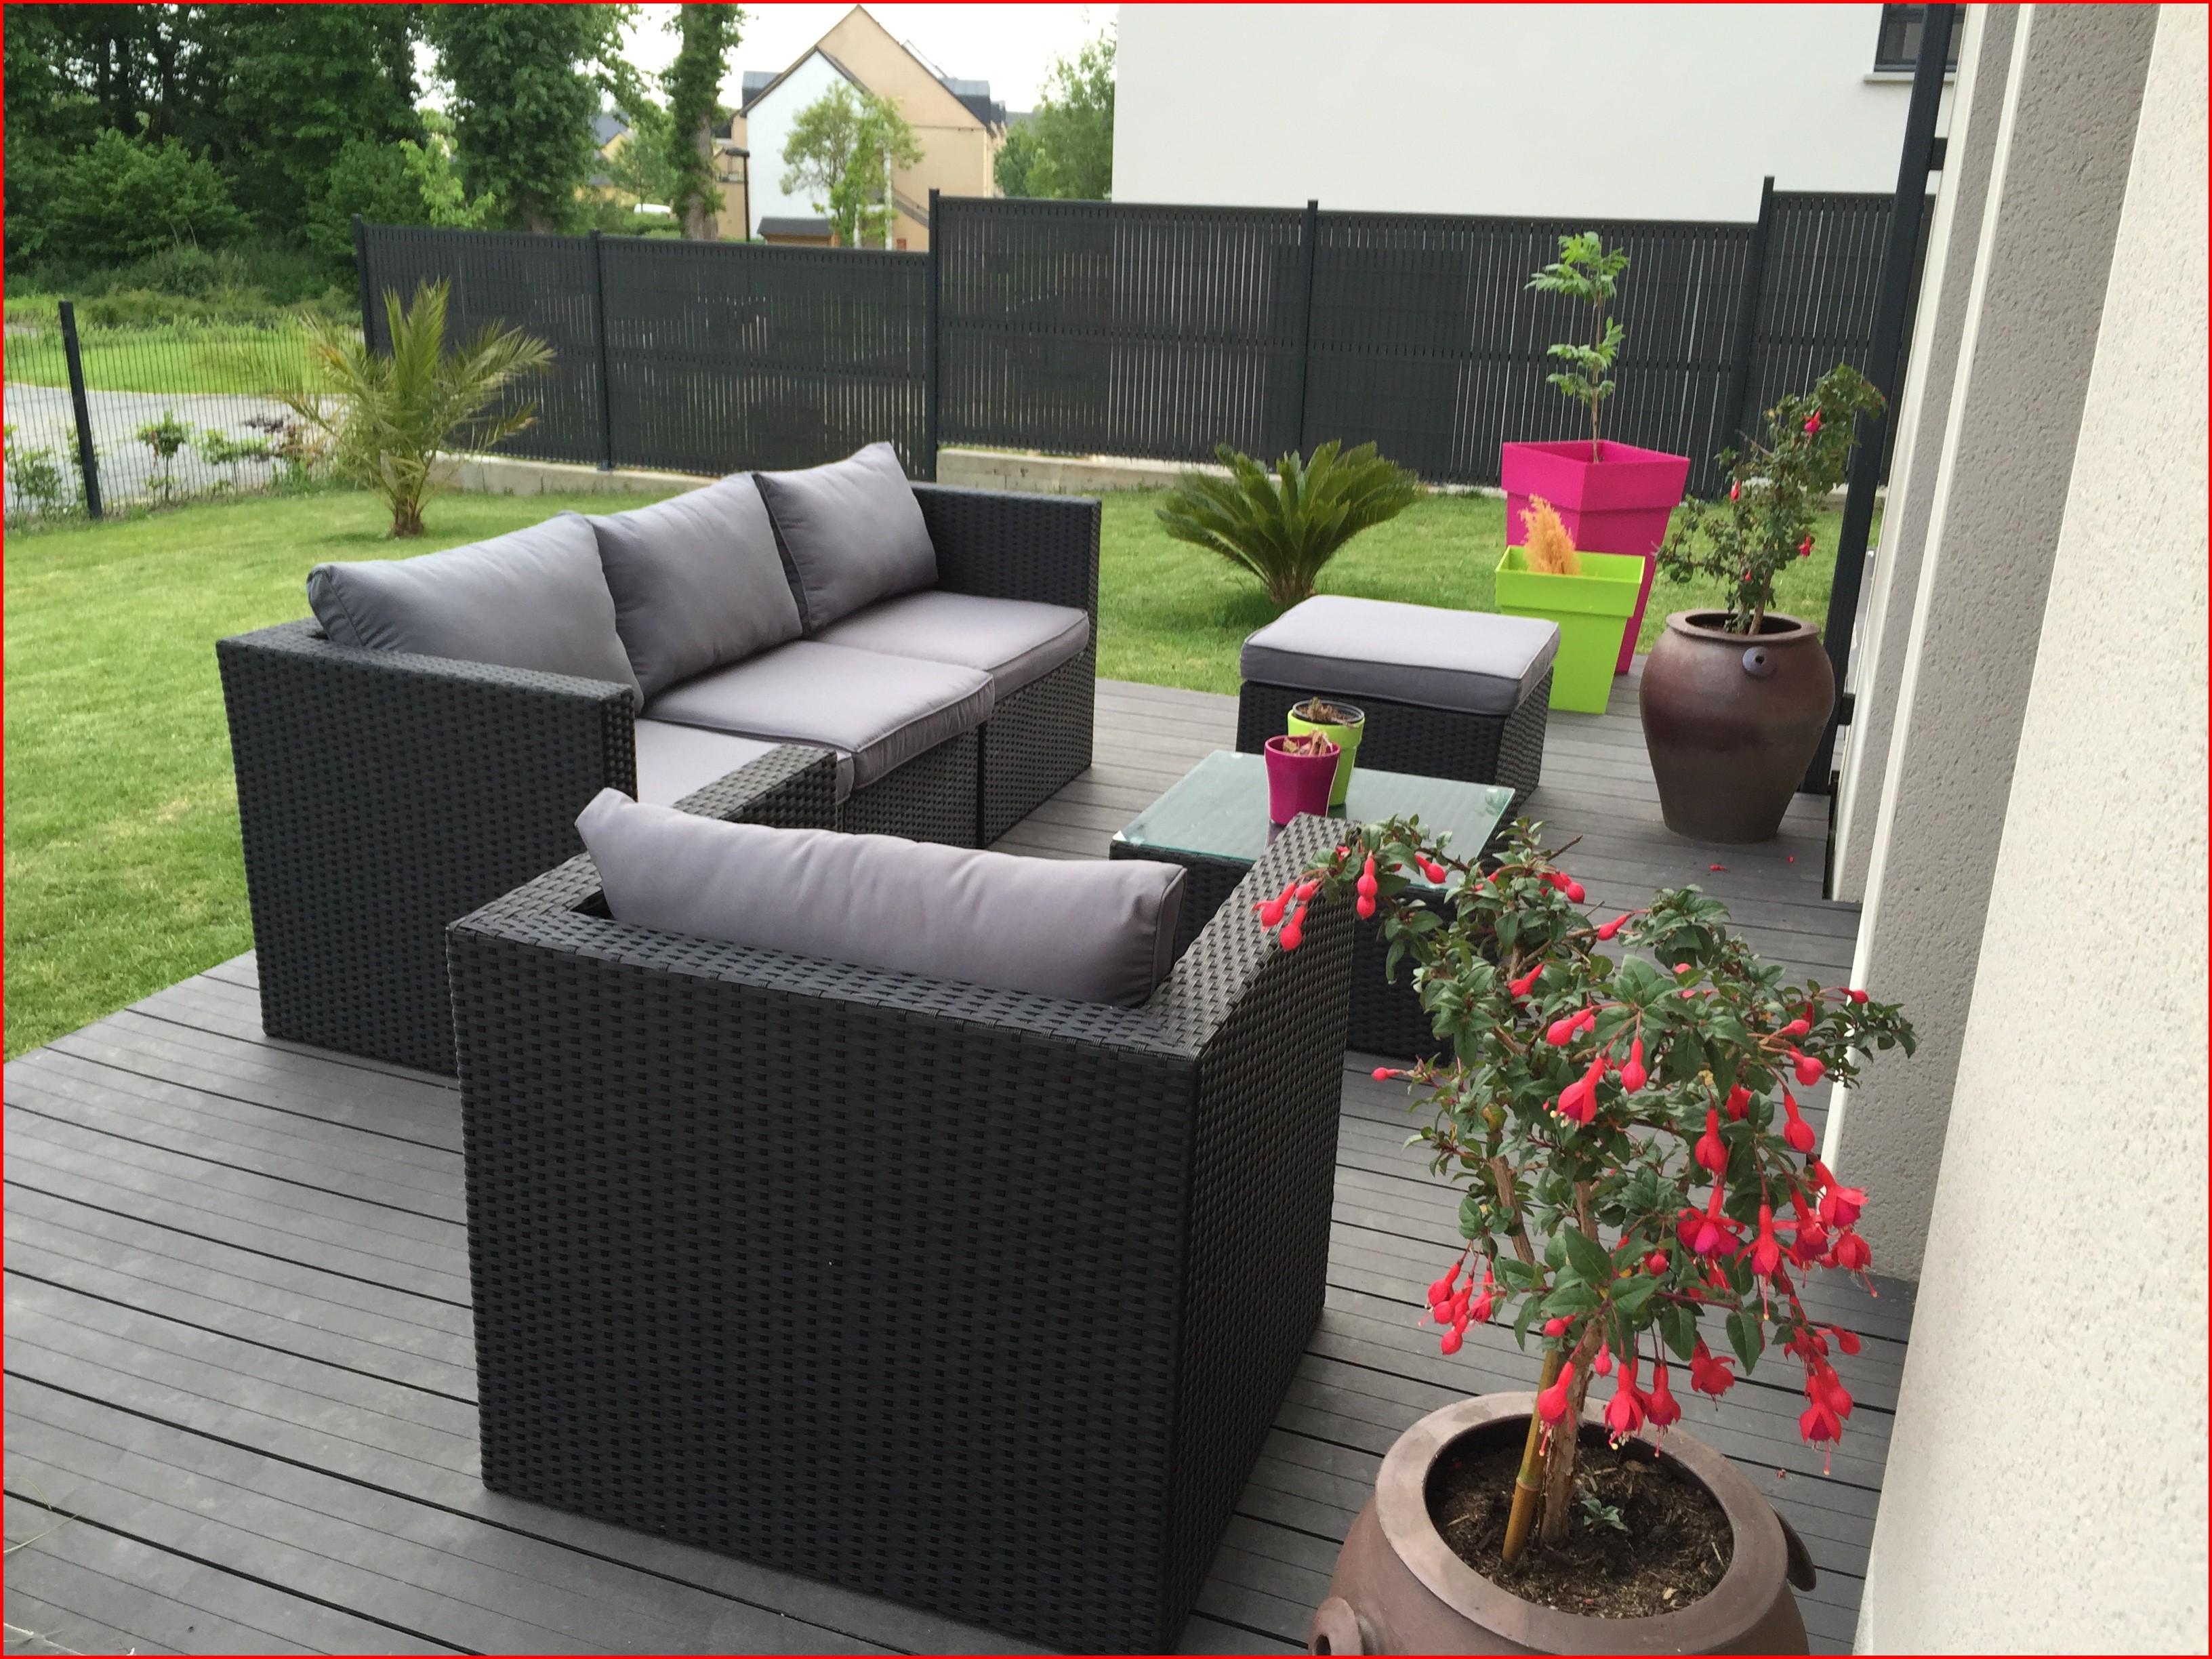 Solde salon de jardin foir\'fouille - Mailleraye.fr jardin